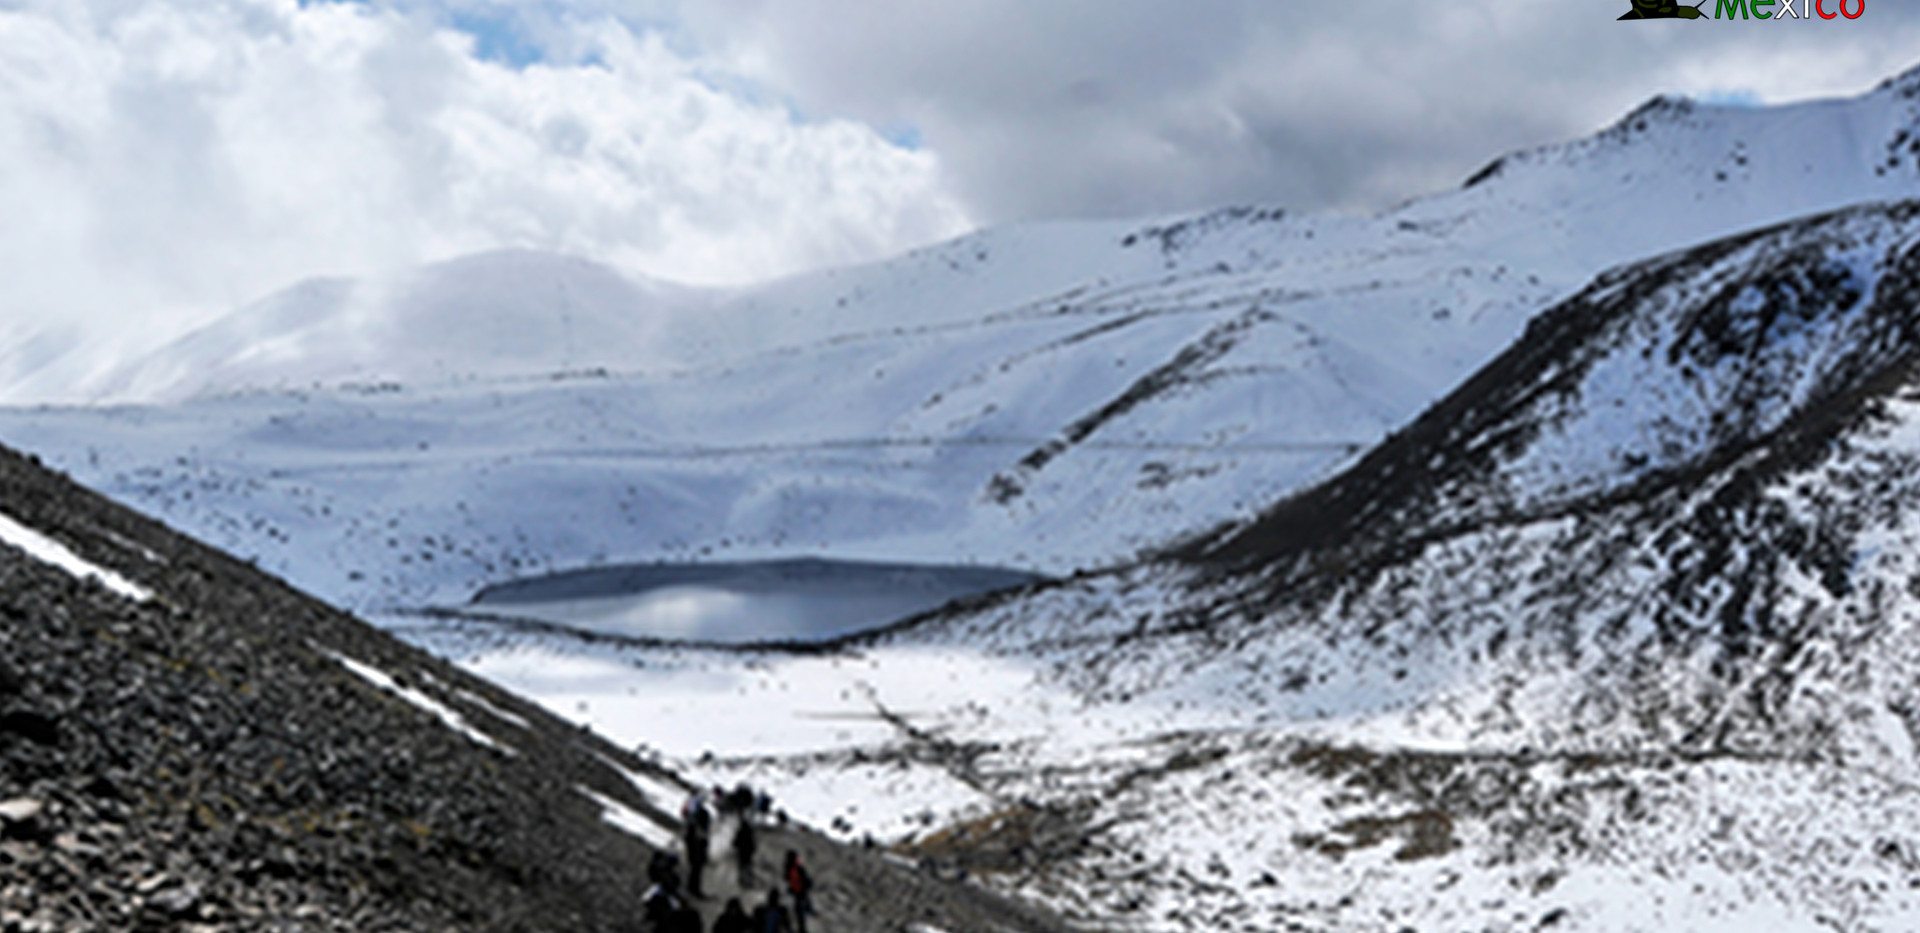 Nevado de Toluca 2.jpg